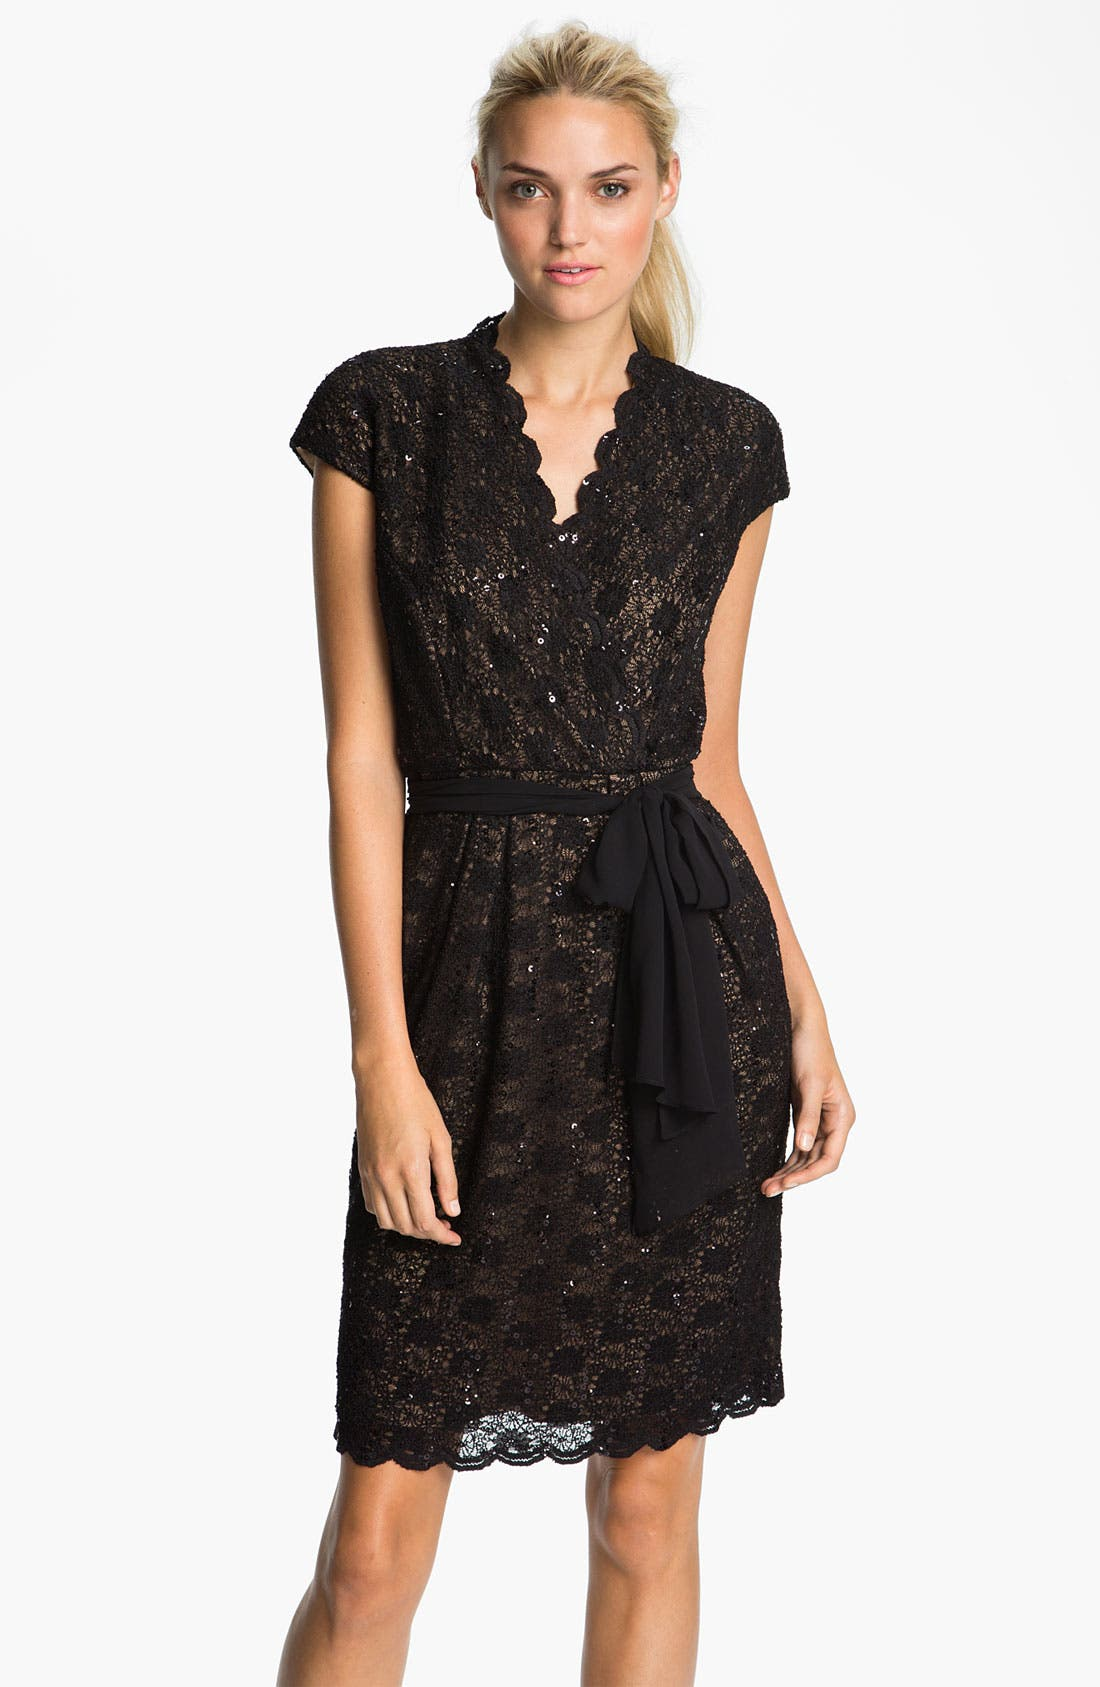 Alternate Image 1 Selected - Alex Evenings Scalloped Lace Surplice Dress